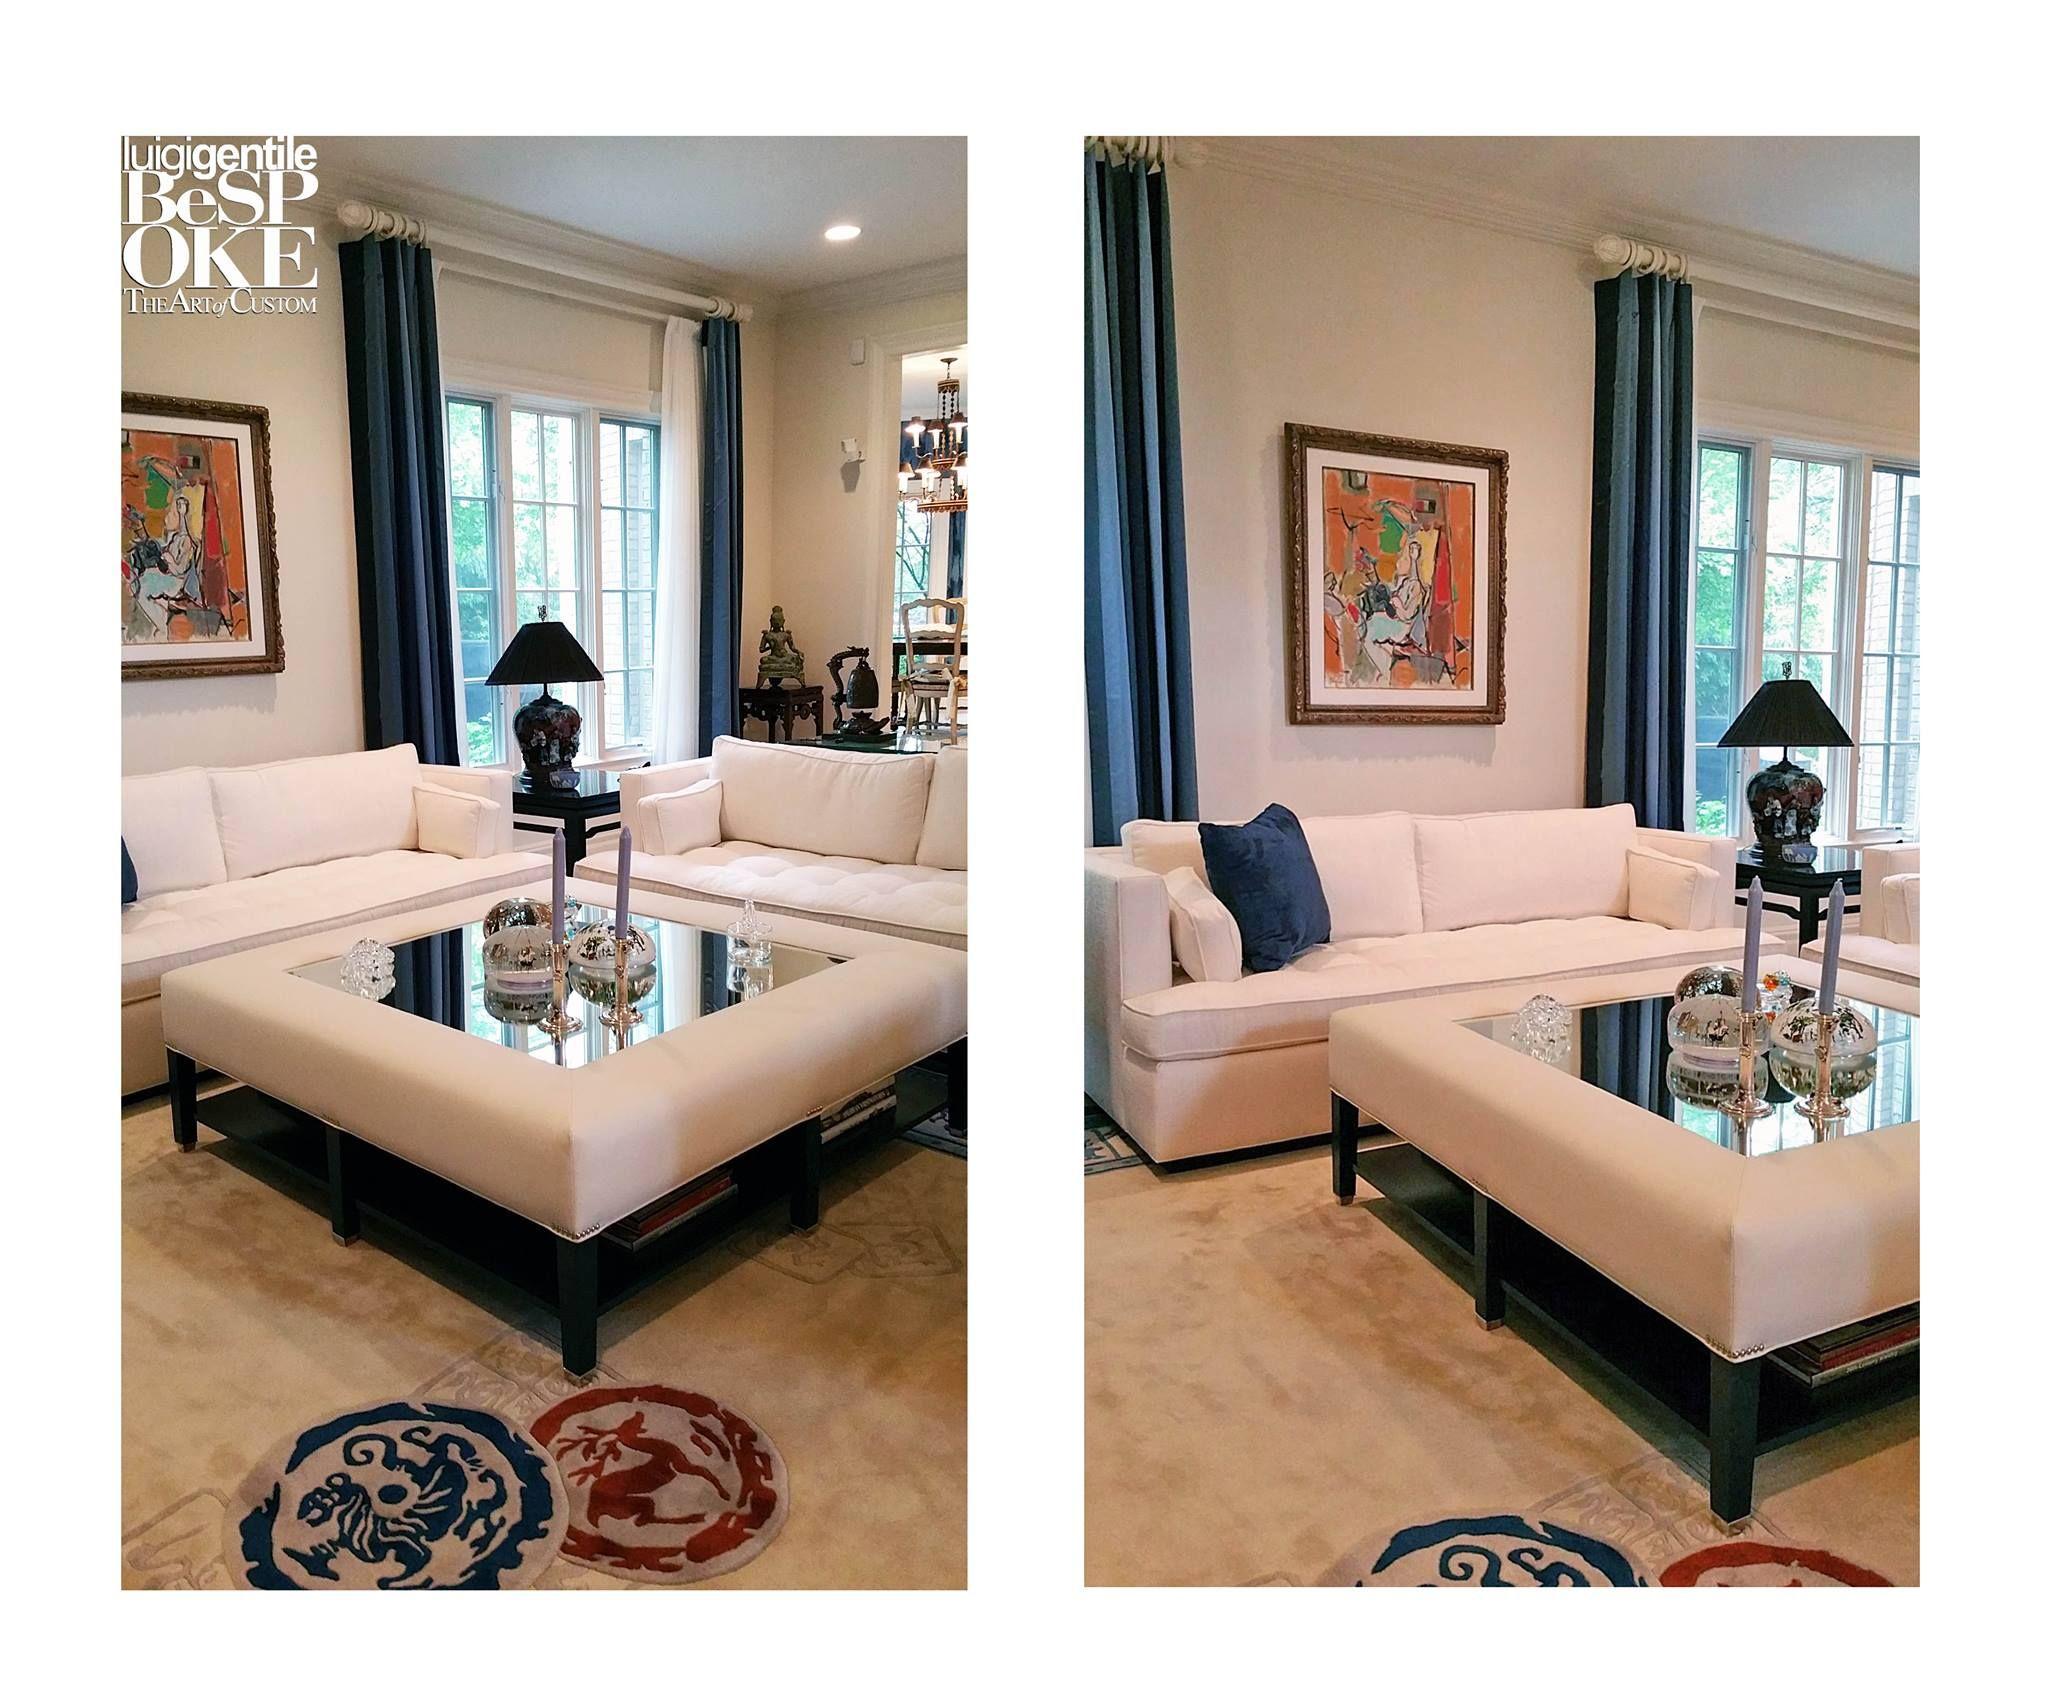 Our Custom Made Jewel Ottoman With Glass Insert For John Michael Murphyu0027s  Room. #